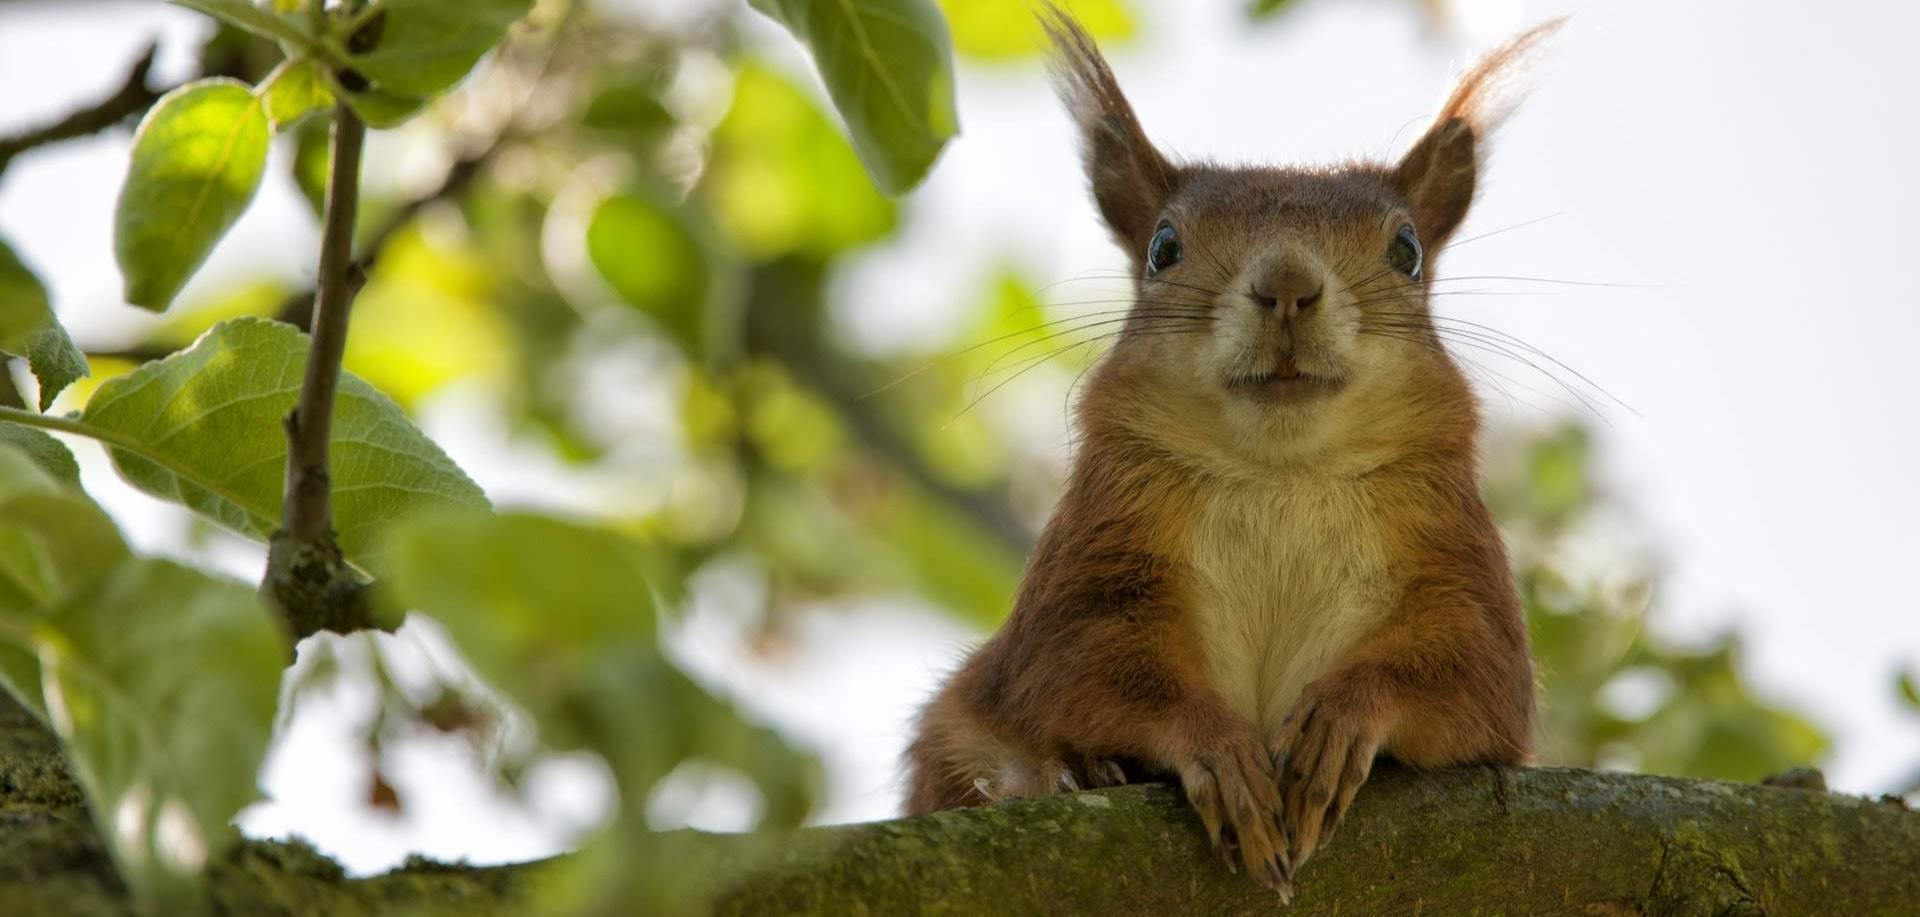 brown-squirrel-closeup-photography-162061_2__1